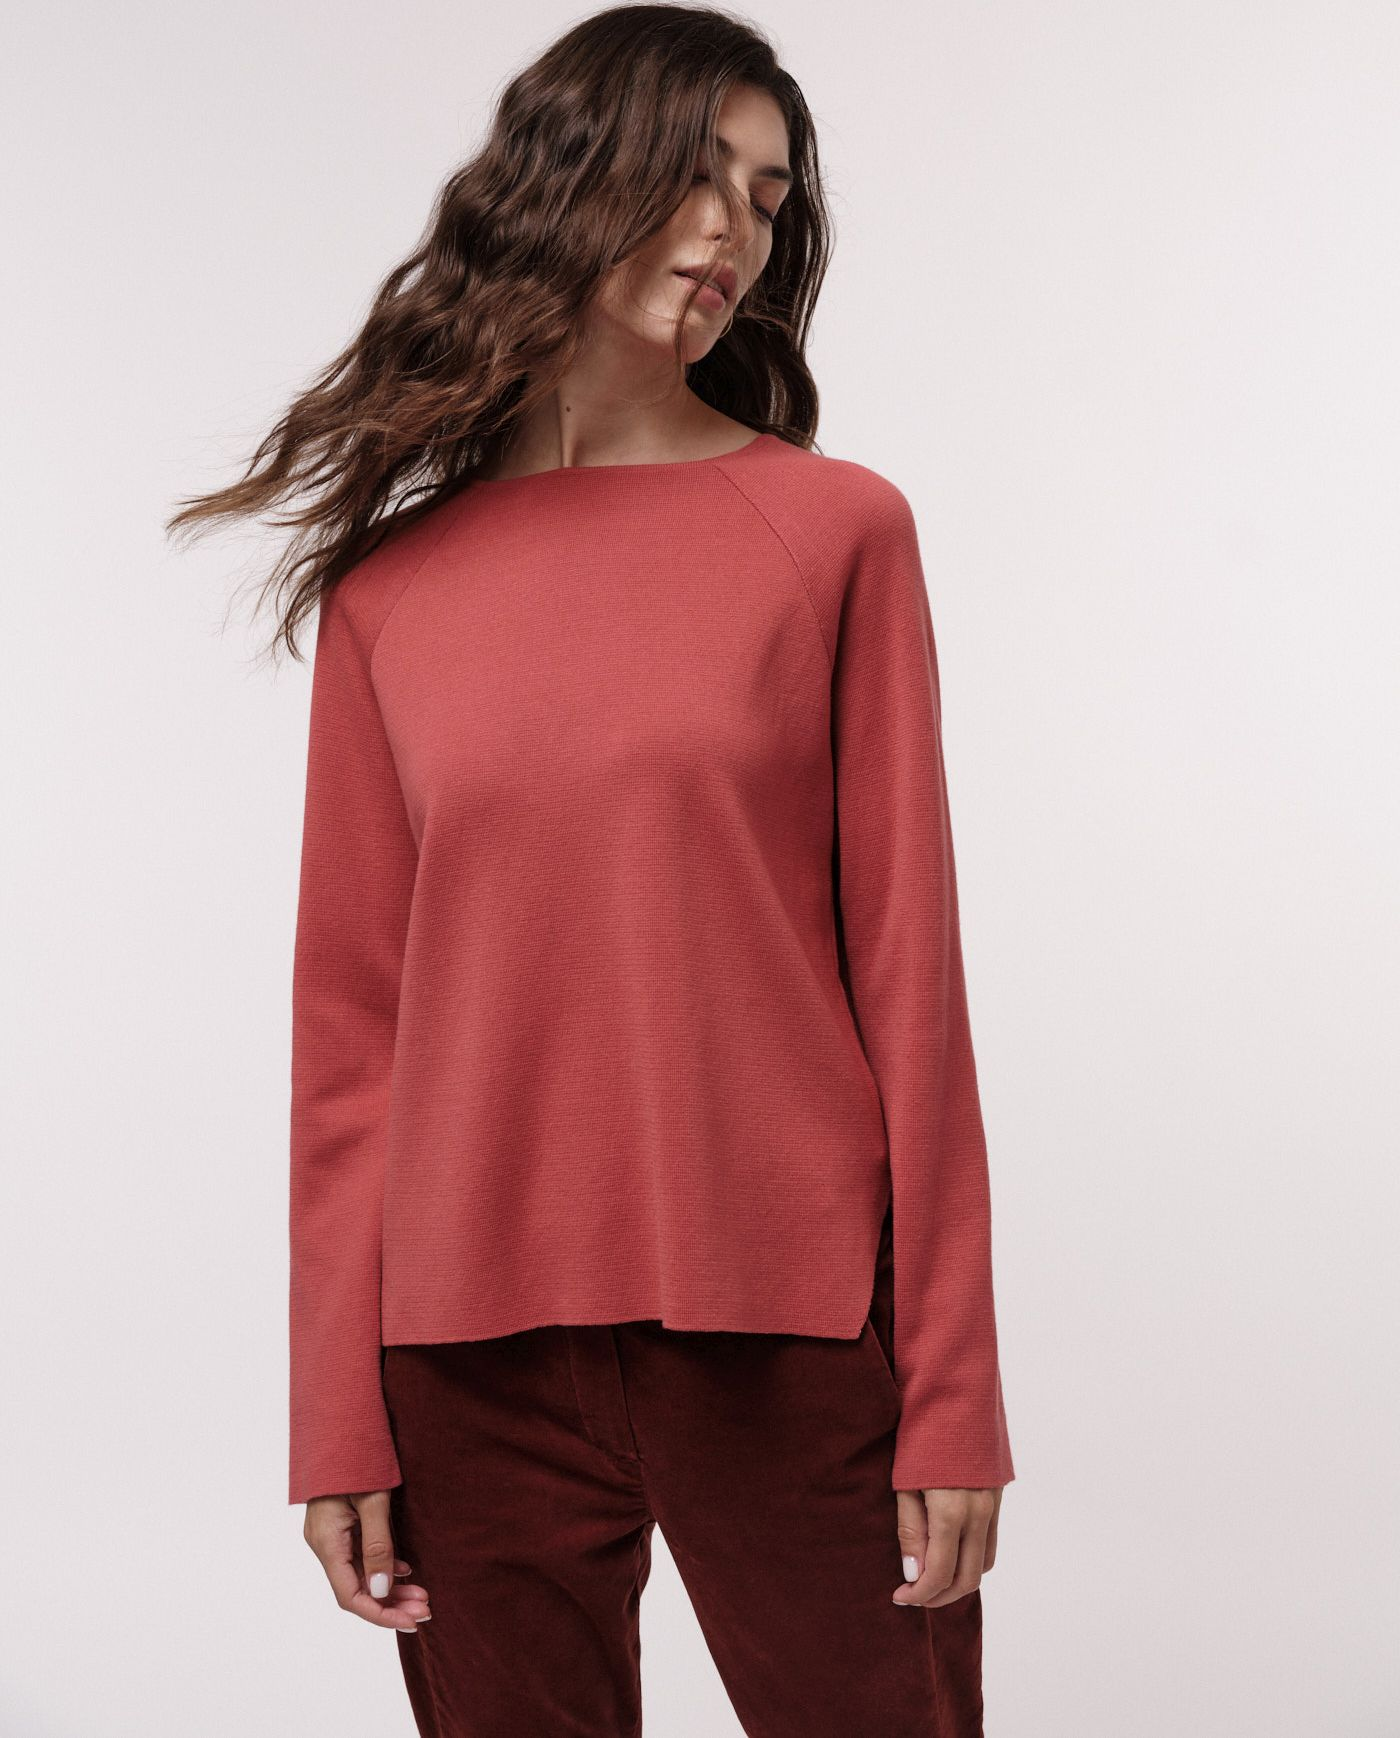 Damen-Pullover Punto Milano rosewood